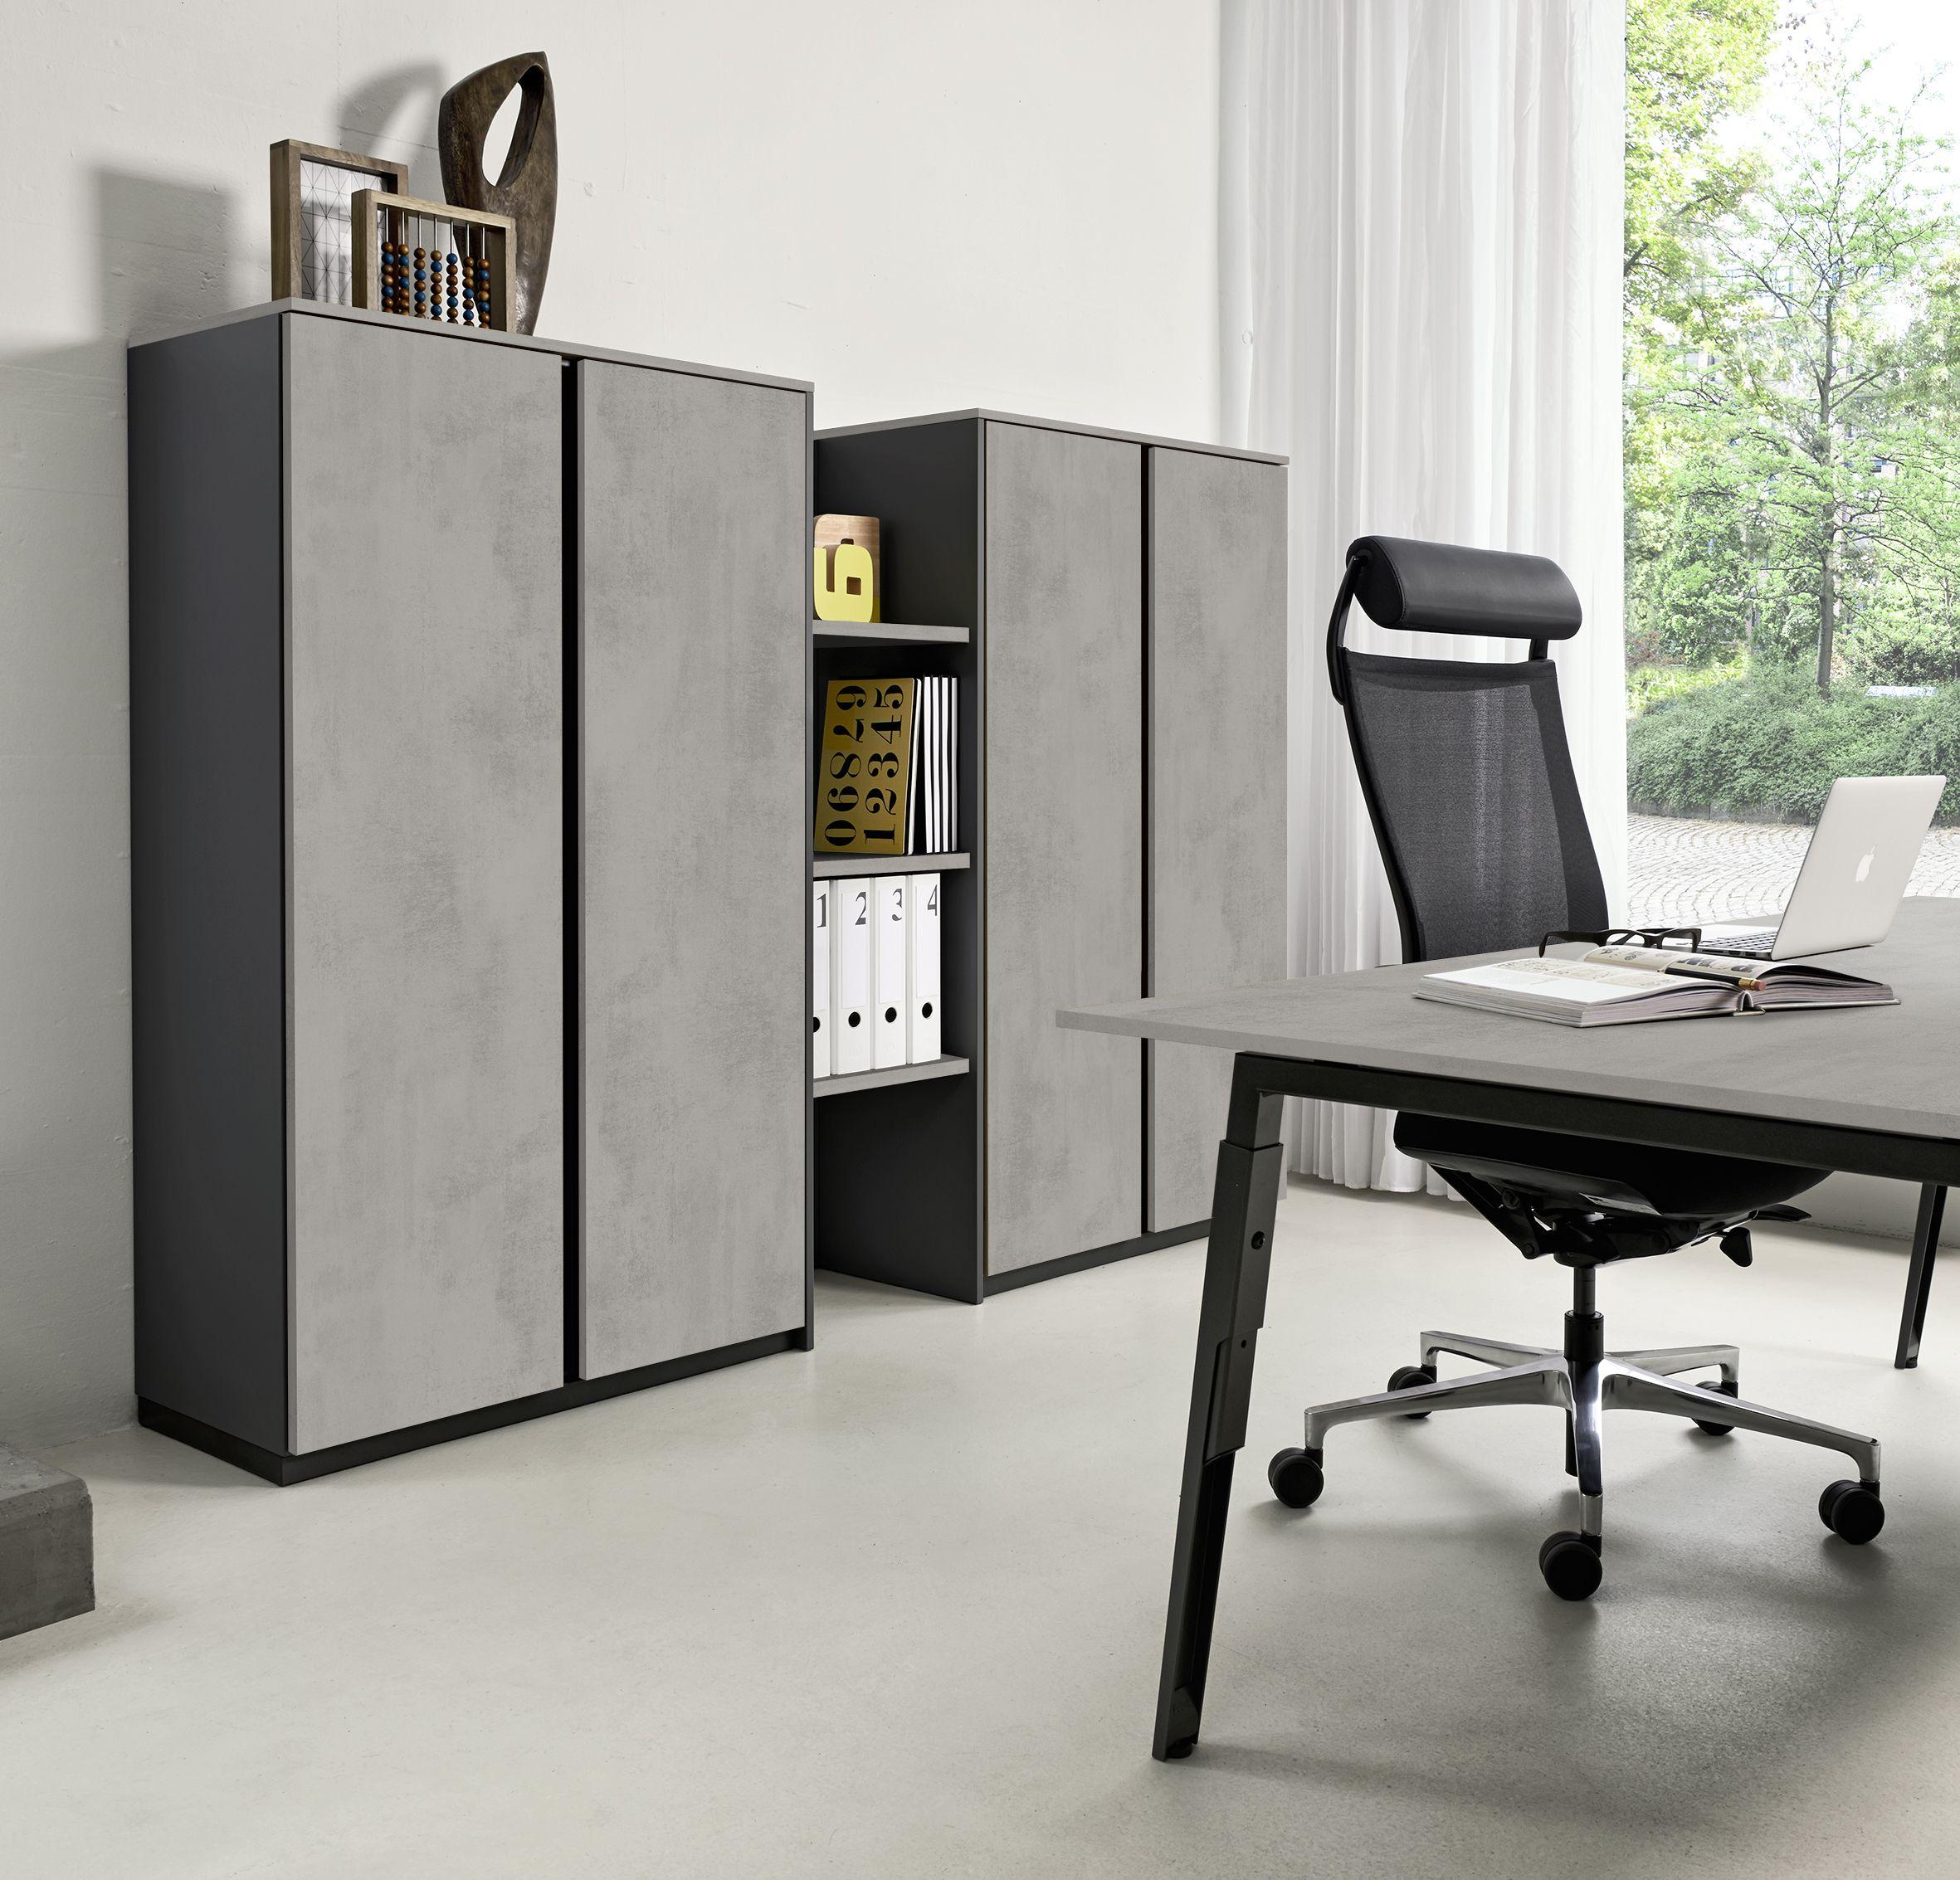 grau im b ro der schrank in betonoptik bringt modernit t in jedes b ro die passende graue. Black Bedroom Furniture Sets. Home Design Ideas